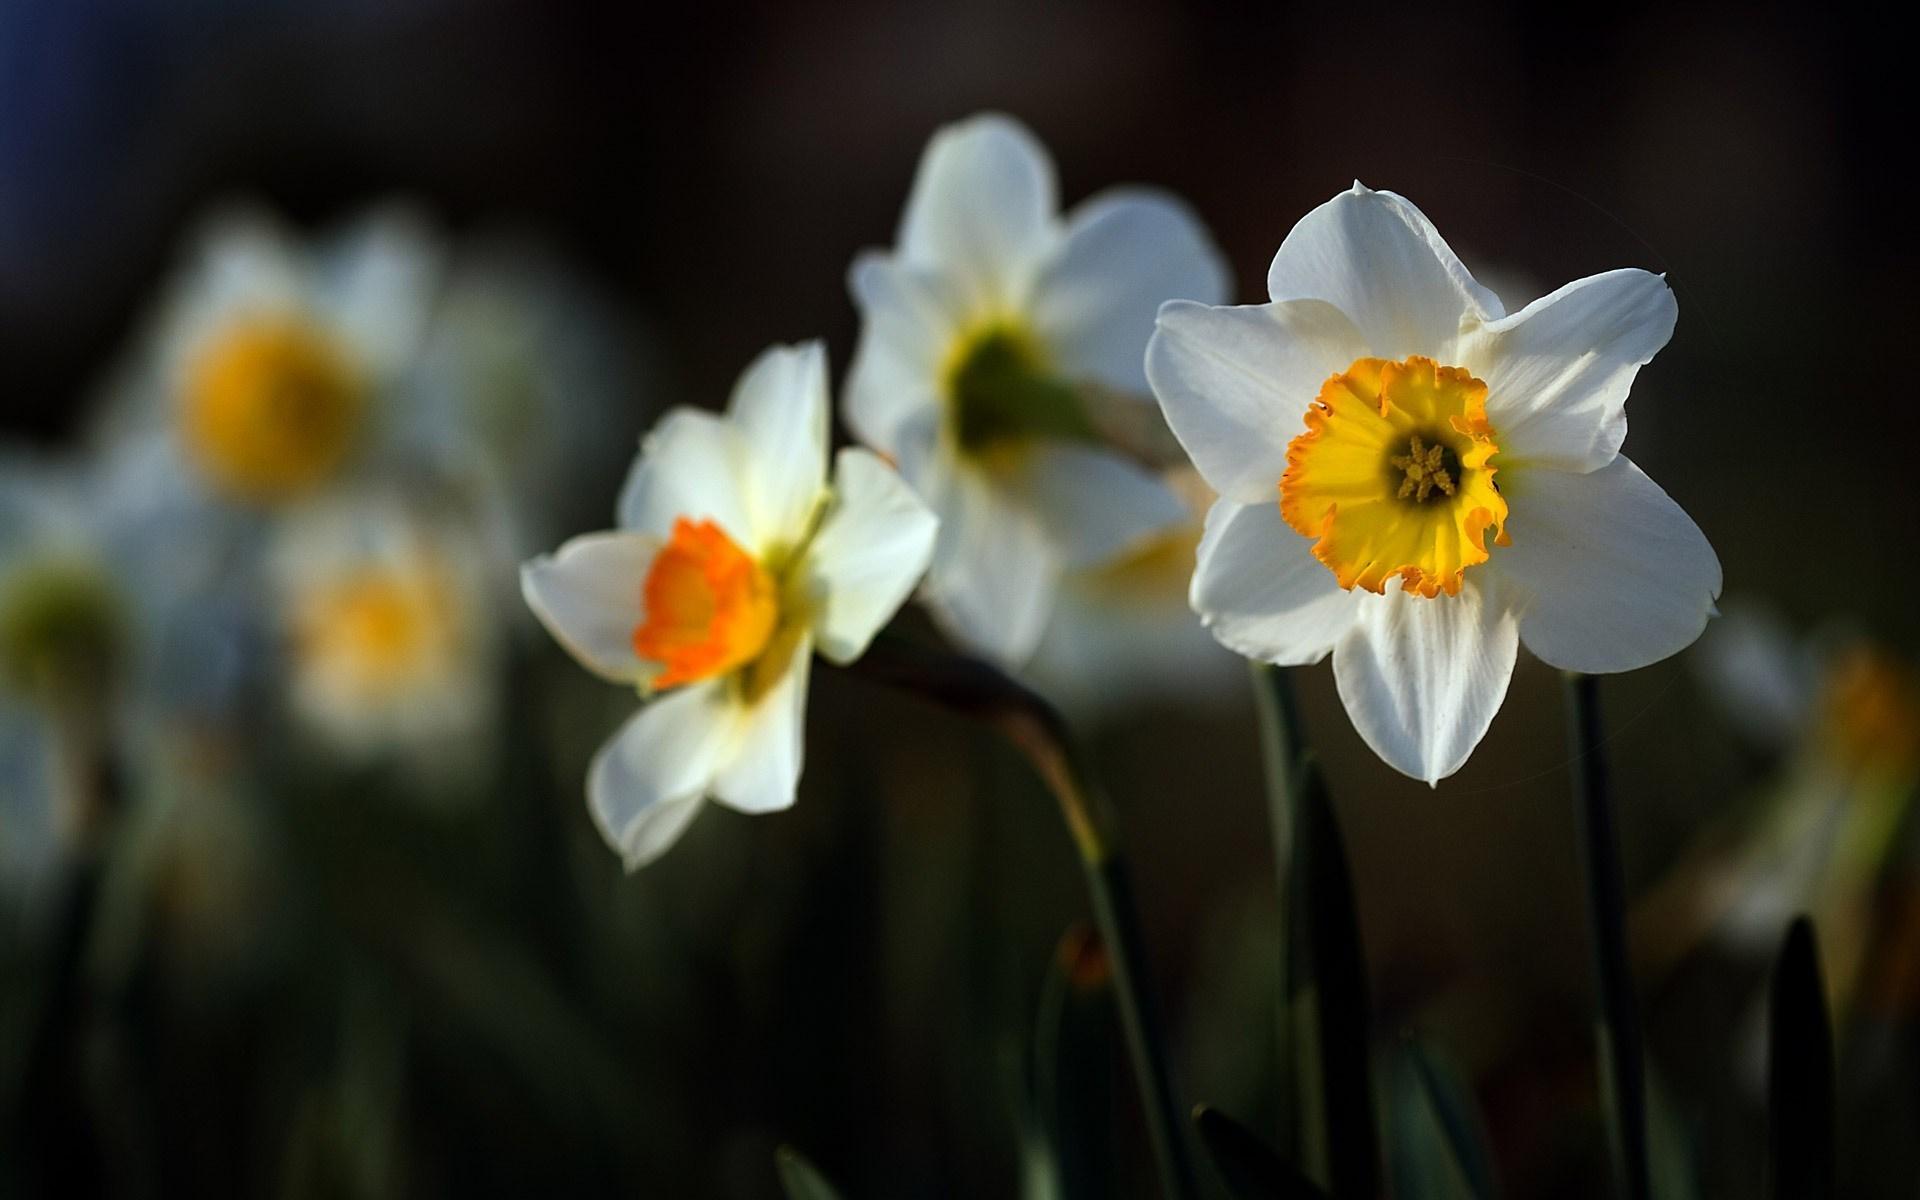 daffodils flower wallpaper 1080p